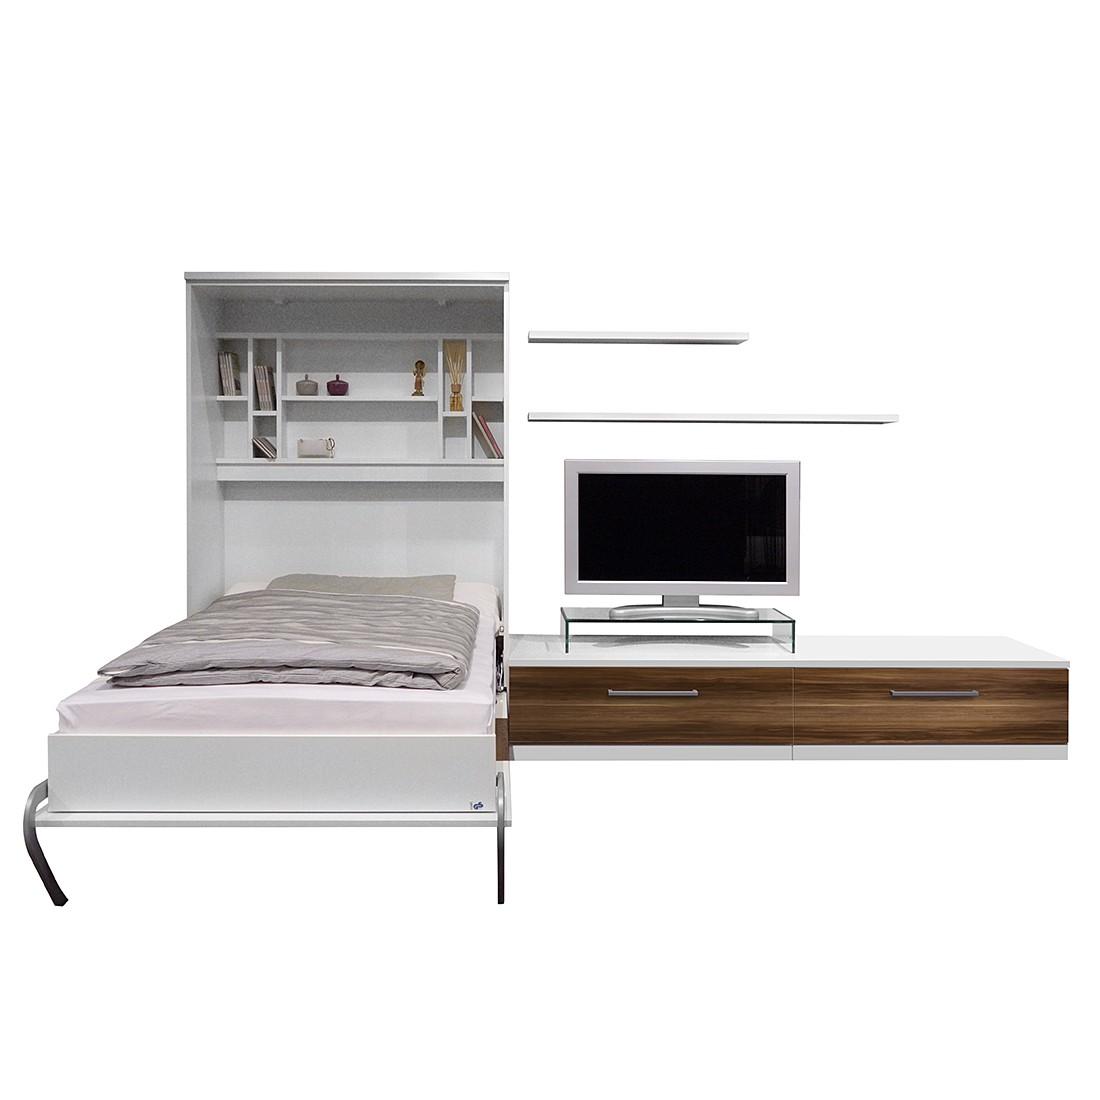 goedkoop Wandklapbed combinatie Majano 110 x 205cm Bonell binnenveringmatras Wit notenboomhouten look Fredriks